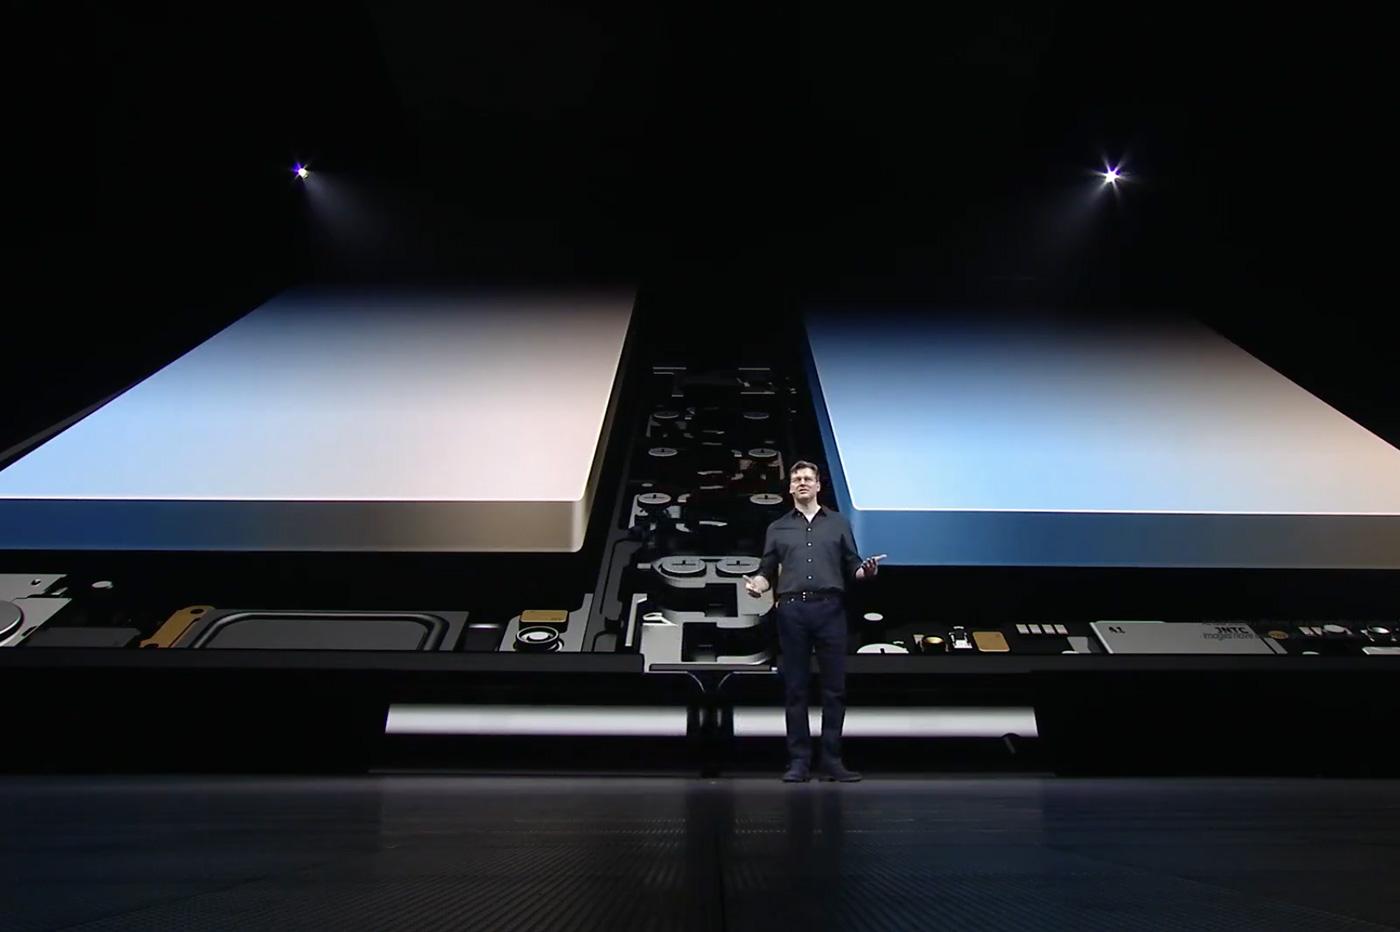 Samsung Galaxy fold batterie